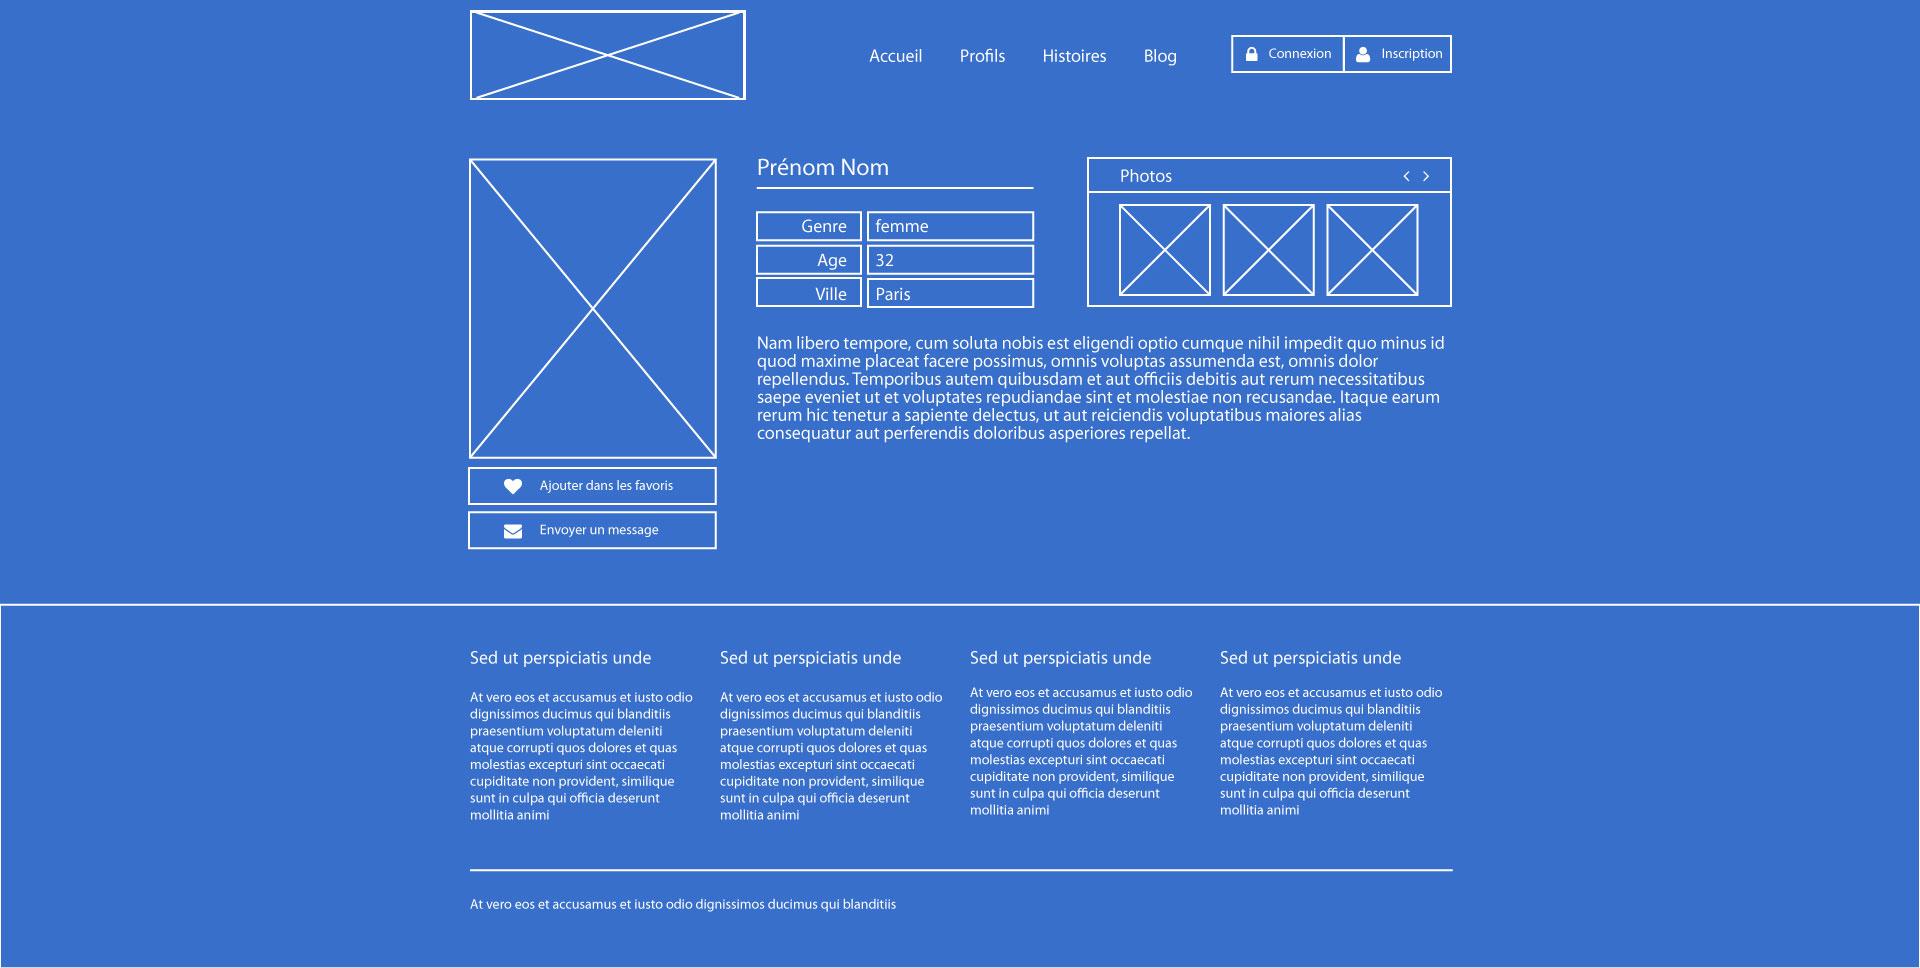 Wireframe site de rencontre profil